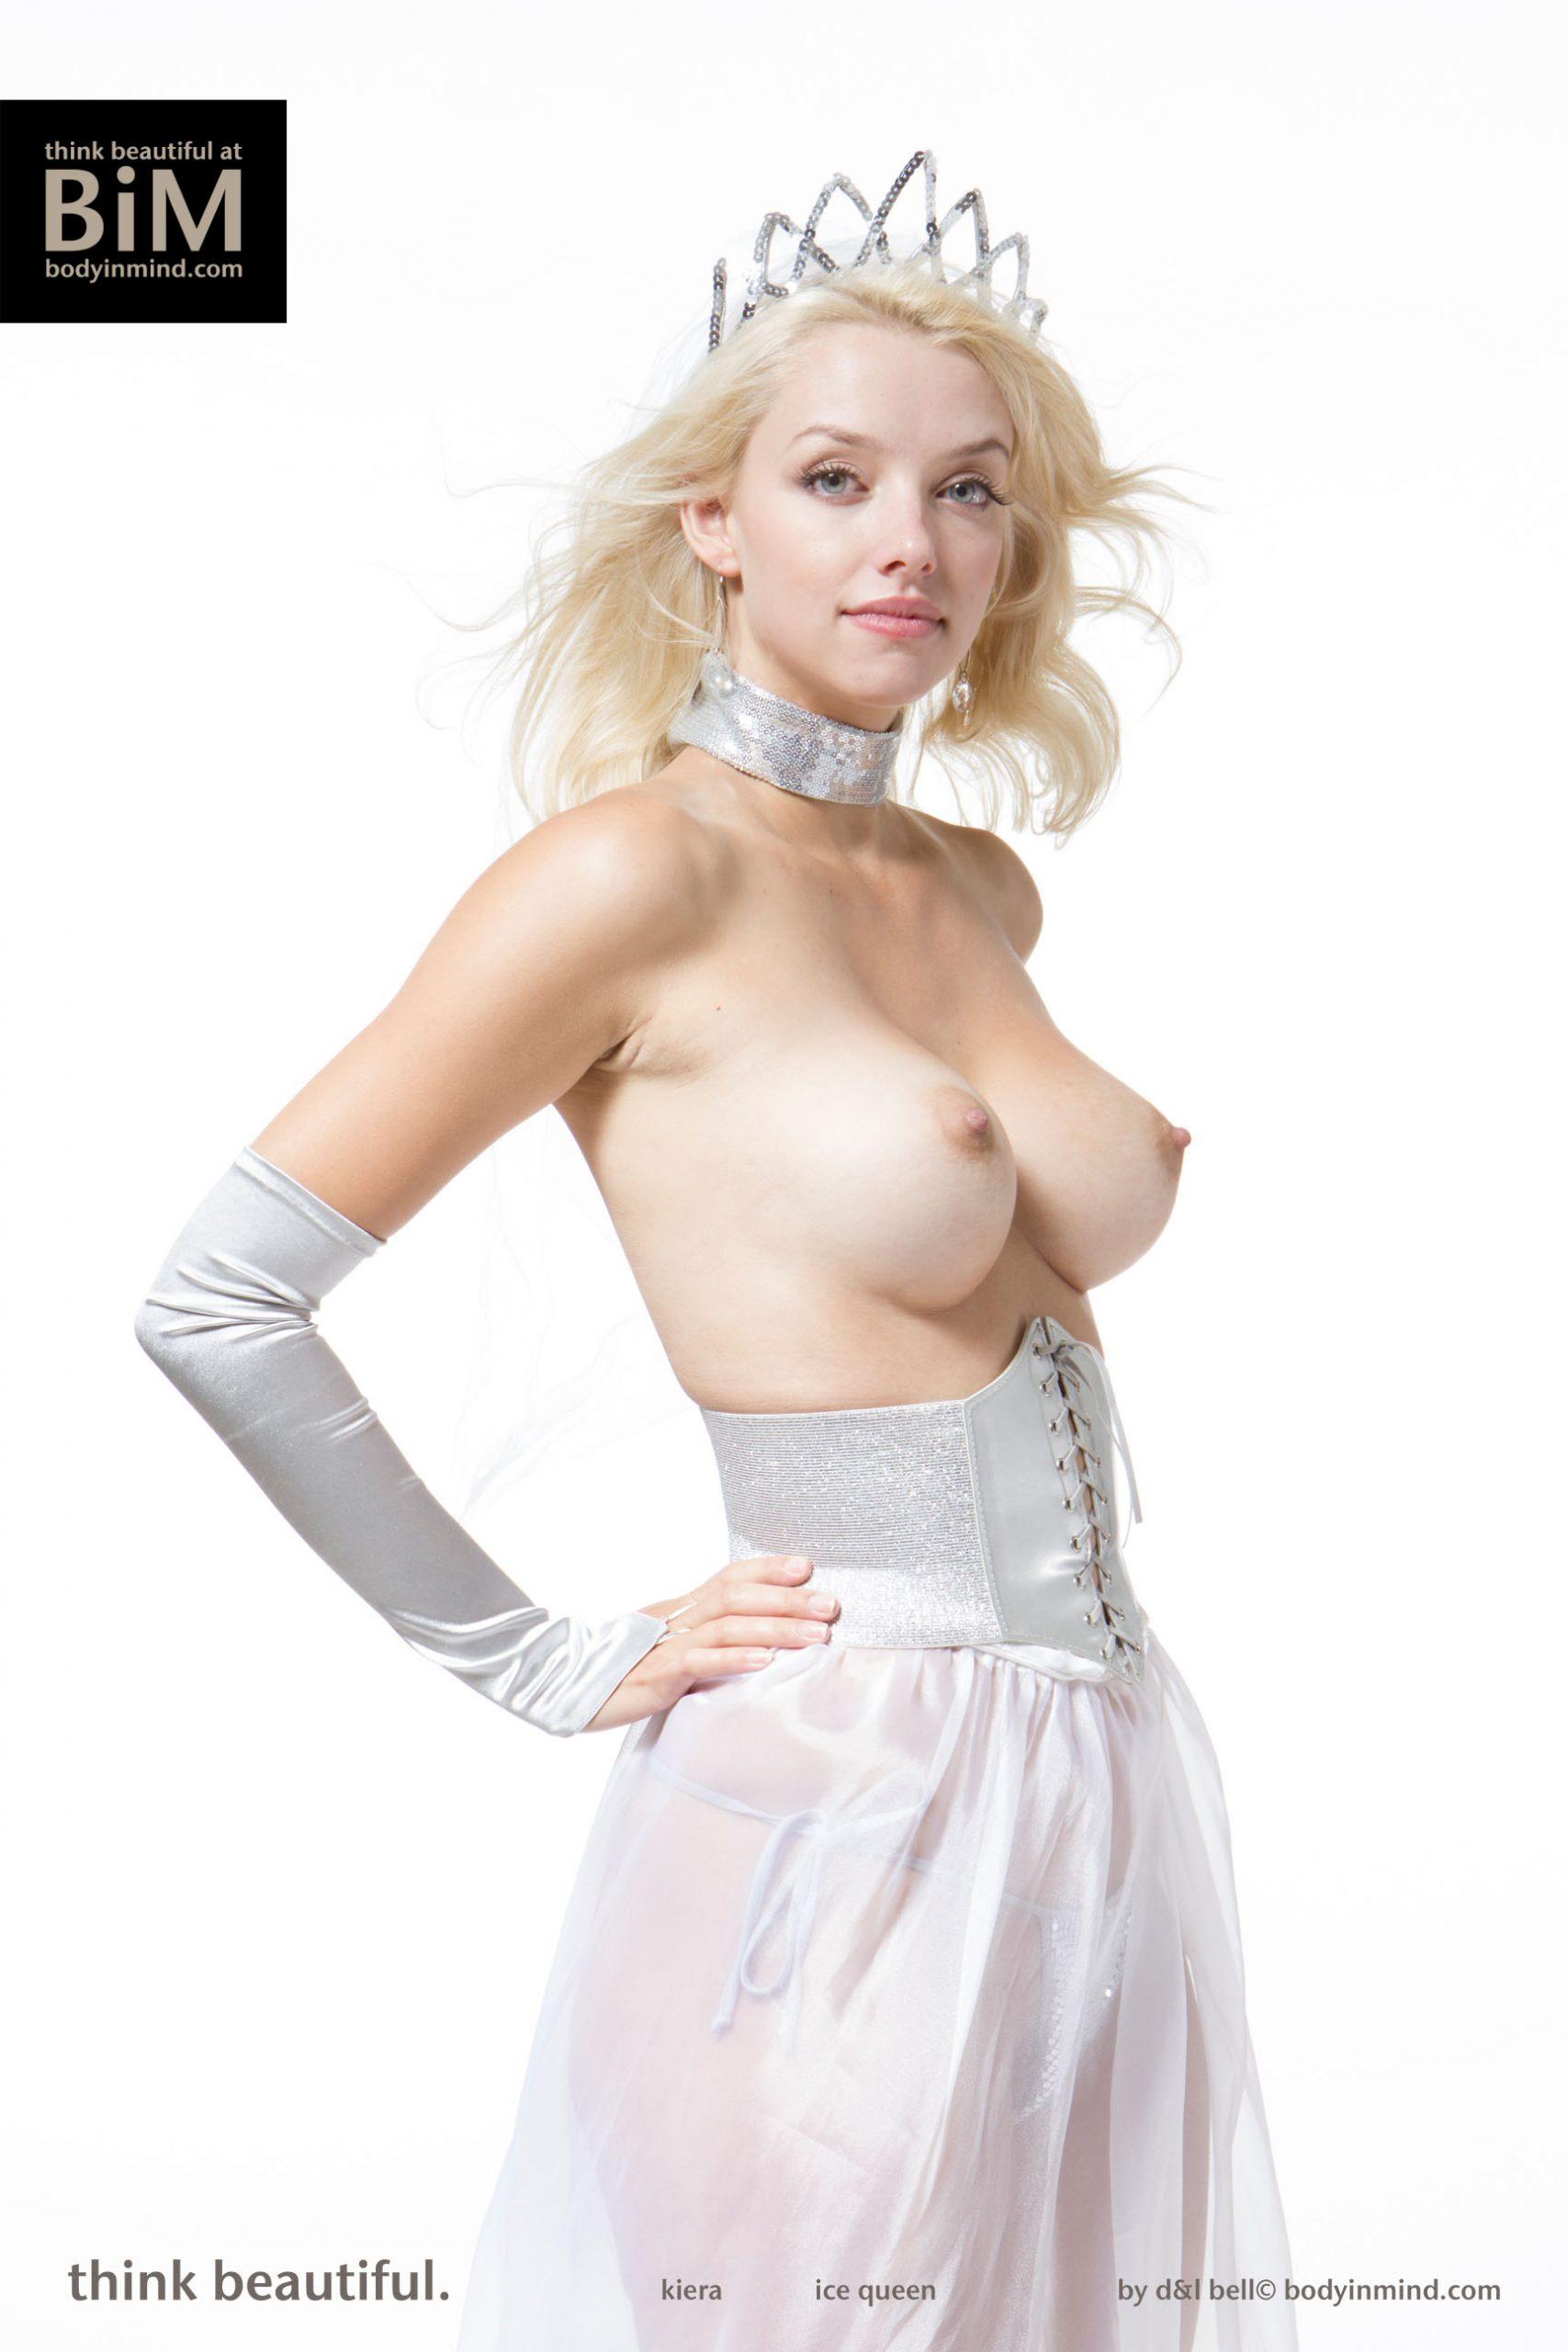 Kiera Big Tit Blonde Princess with Tiara for Body in Mind